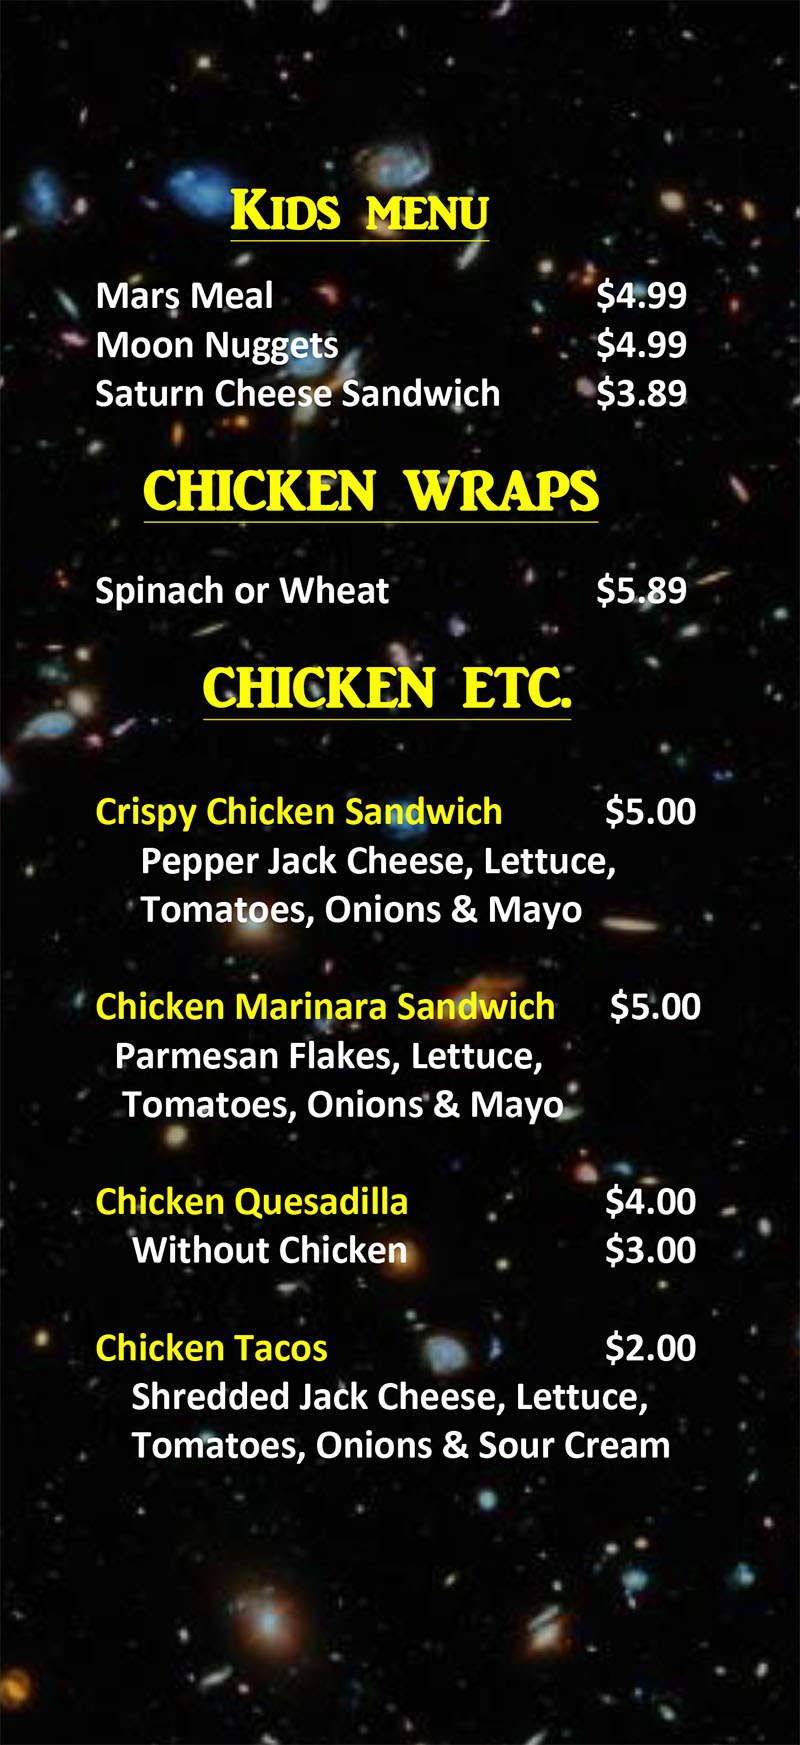 Stellar Wings menu - kids, wraps, chicken